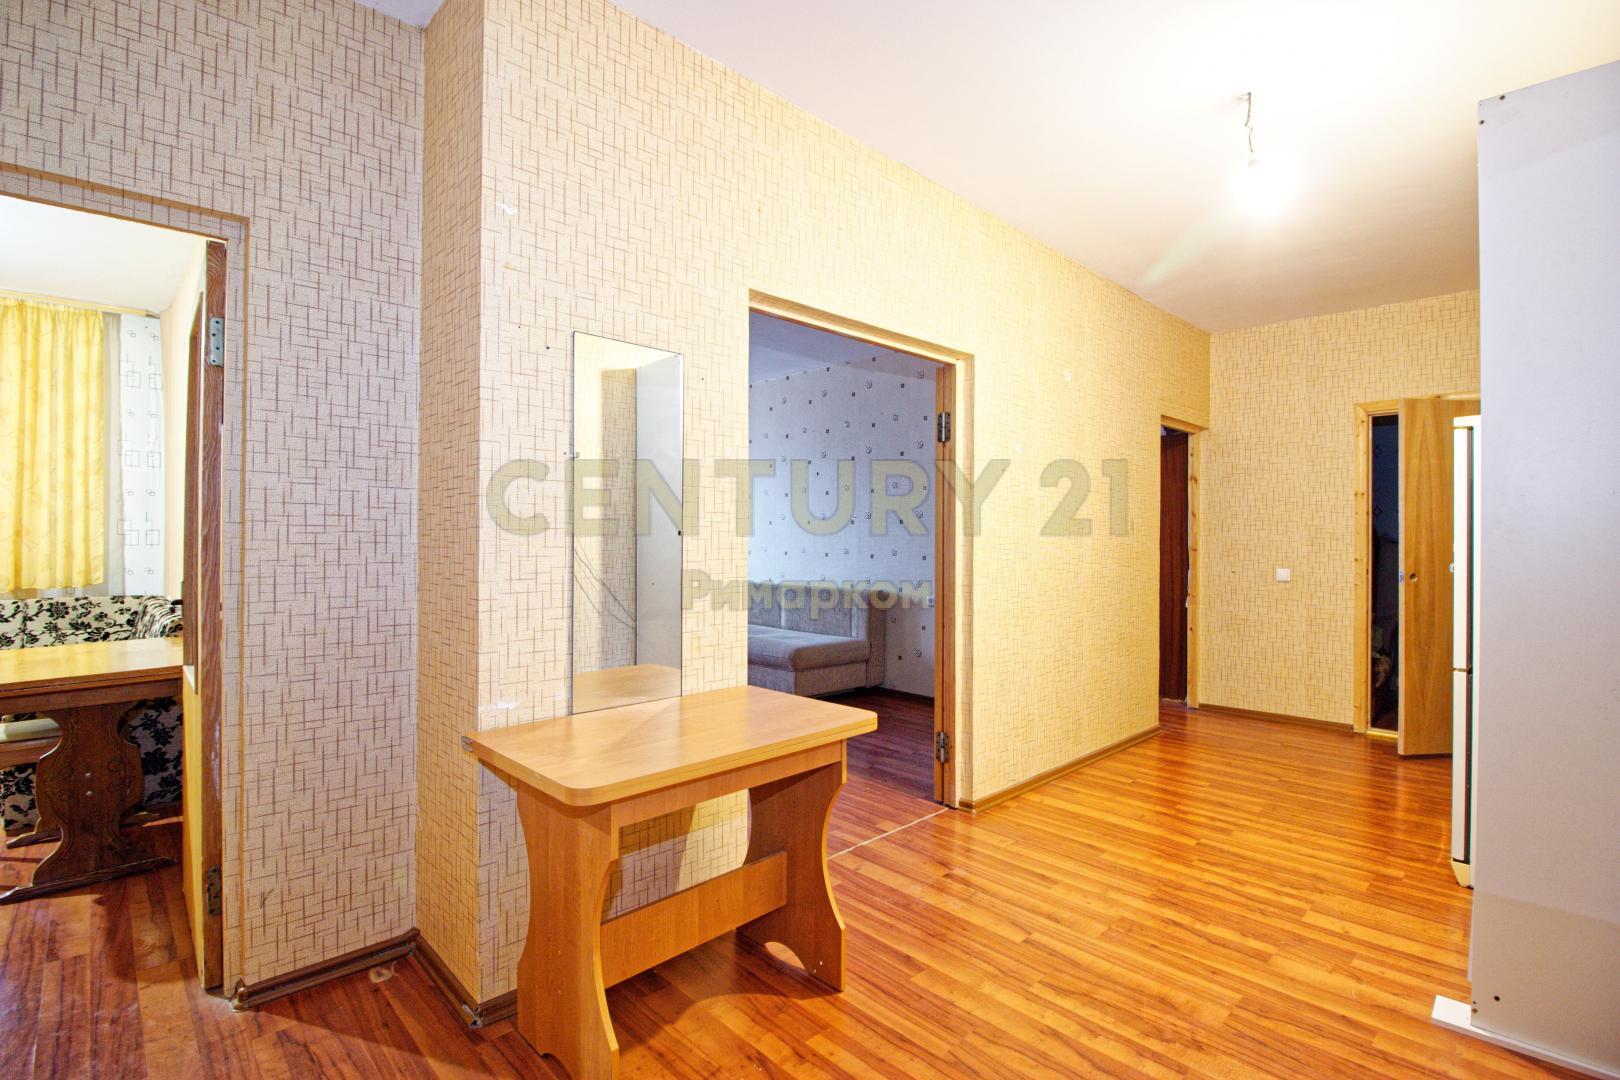 Продается двухкомнатная квартира за 5 250 000 рублей. Московская обл, г Чехов, ул Дружбы, д 2А.